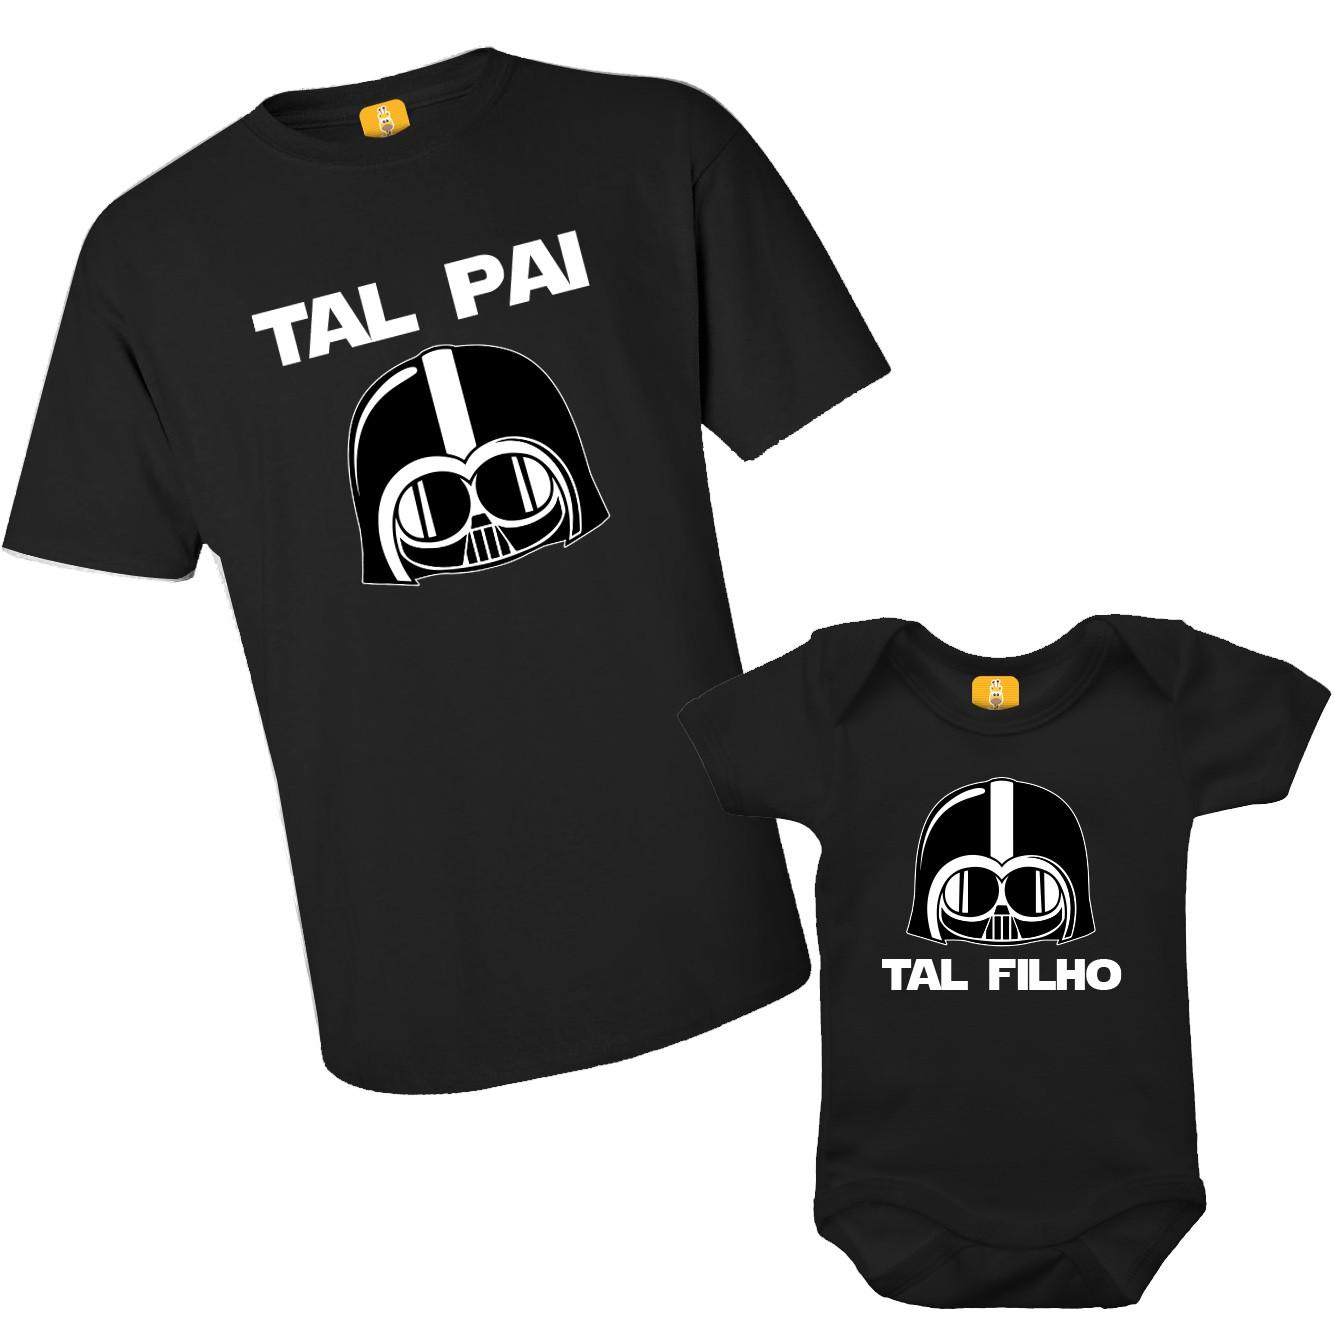 Kit Camiseta e Body Tal Pai Tal Filho - Darth Vader Star Wars